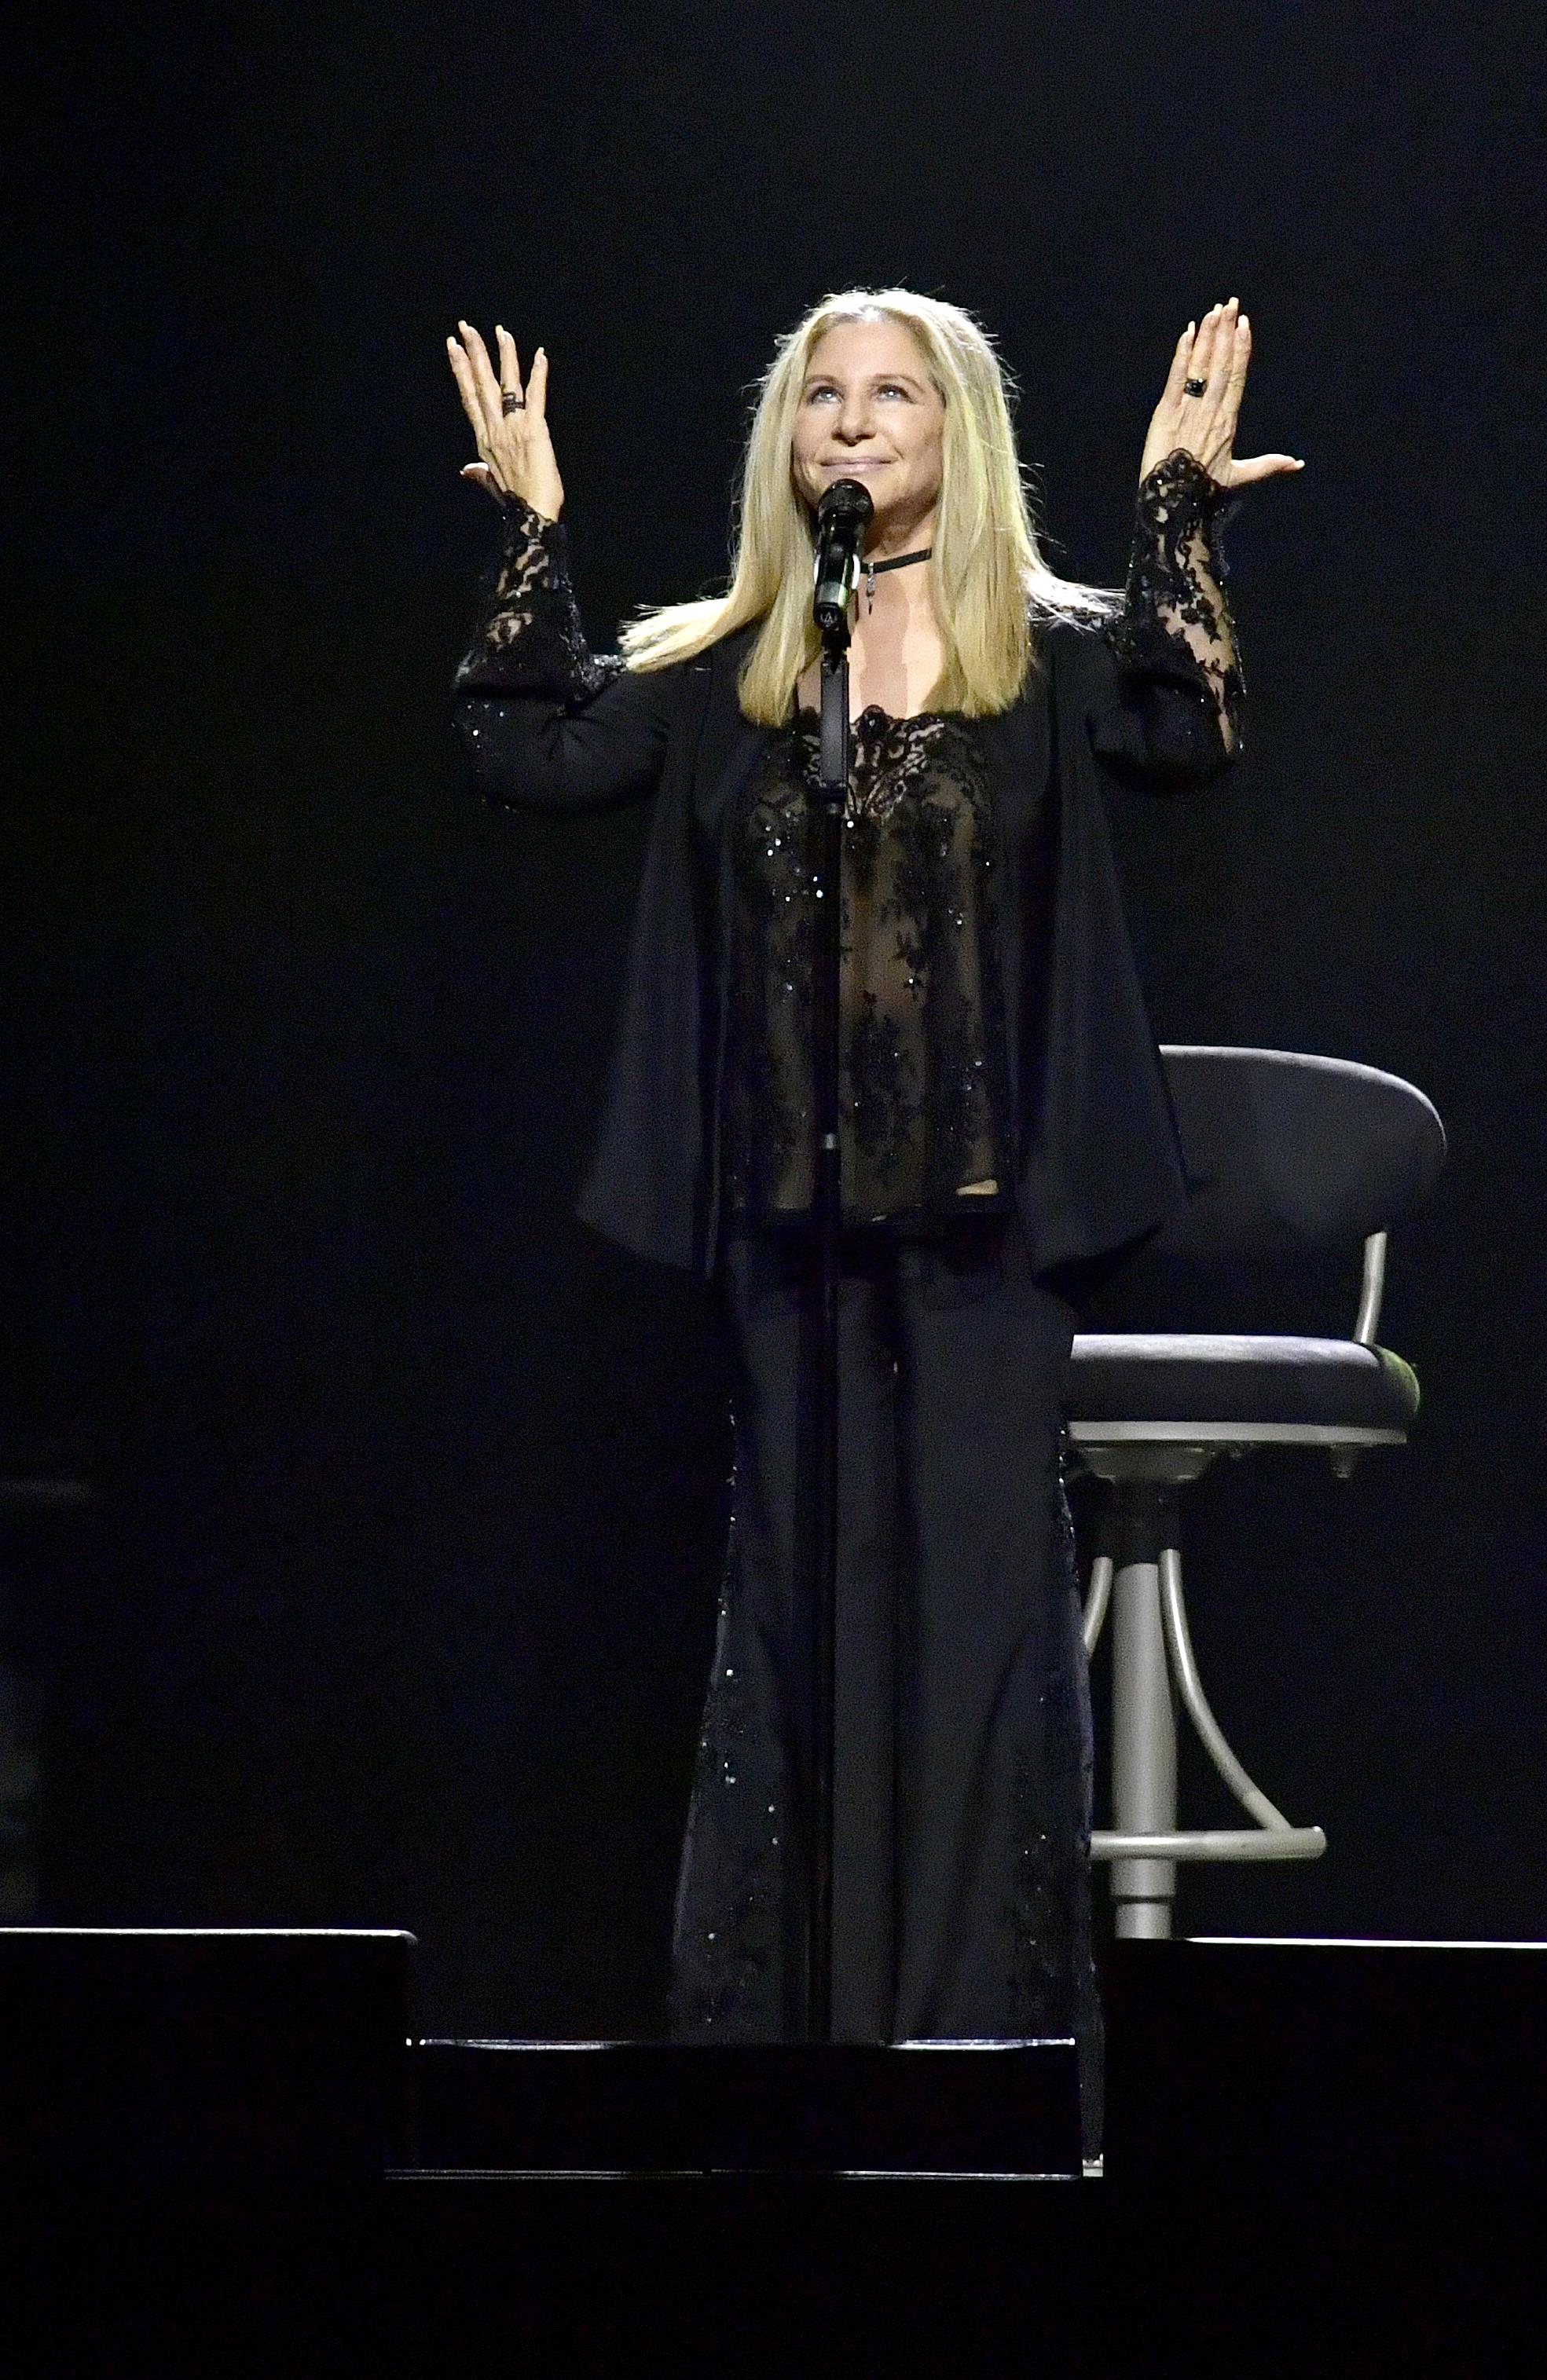 Barbra Streisand for Getty Images at TD Garden